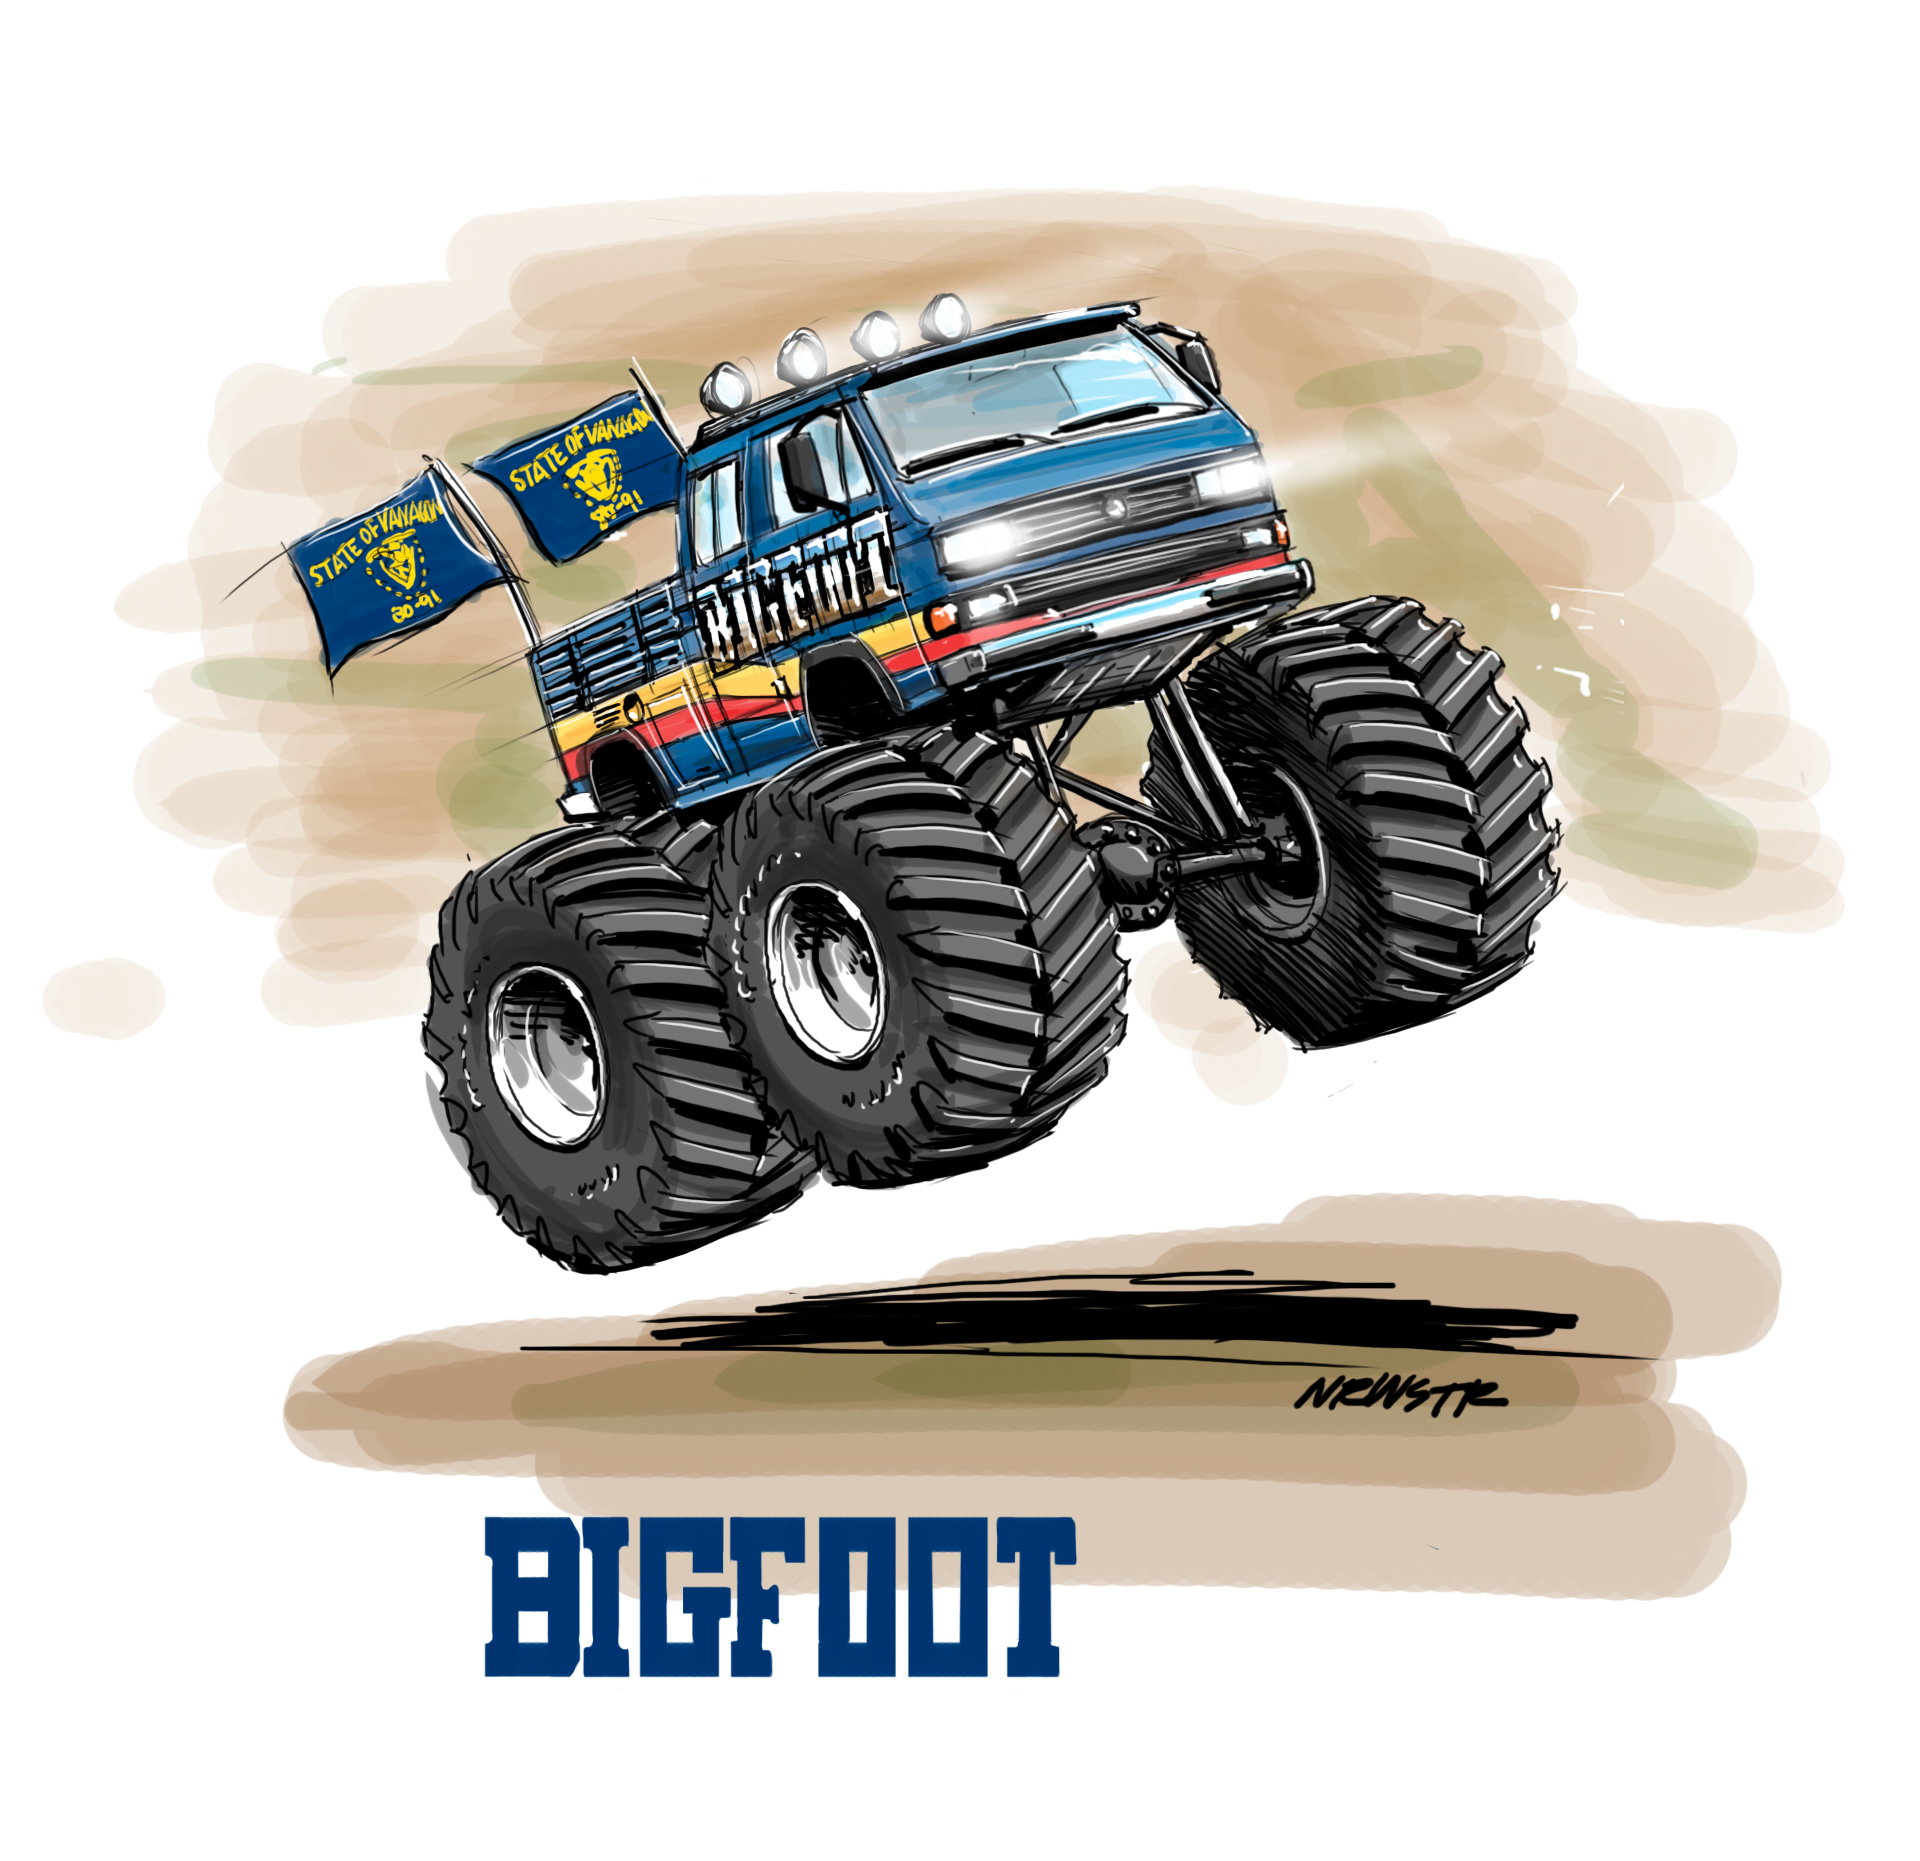 bigfoot-sketch.jpg